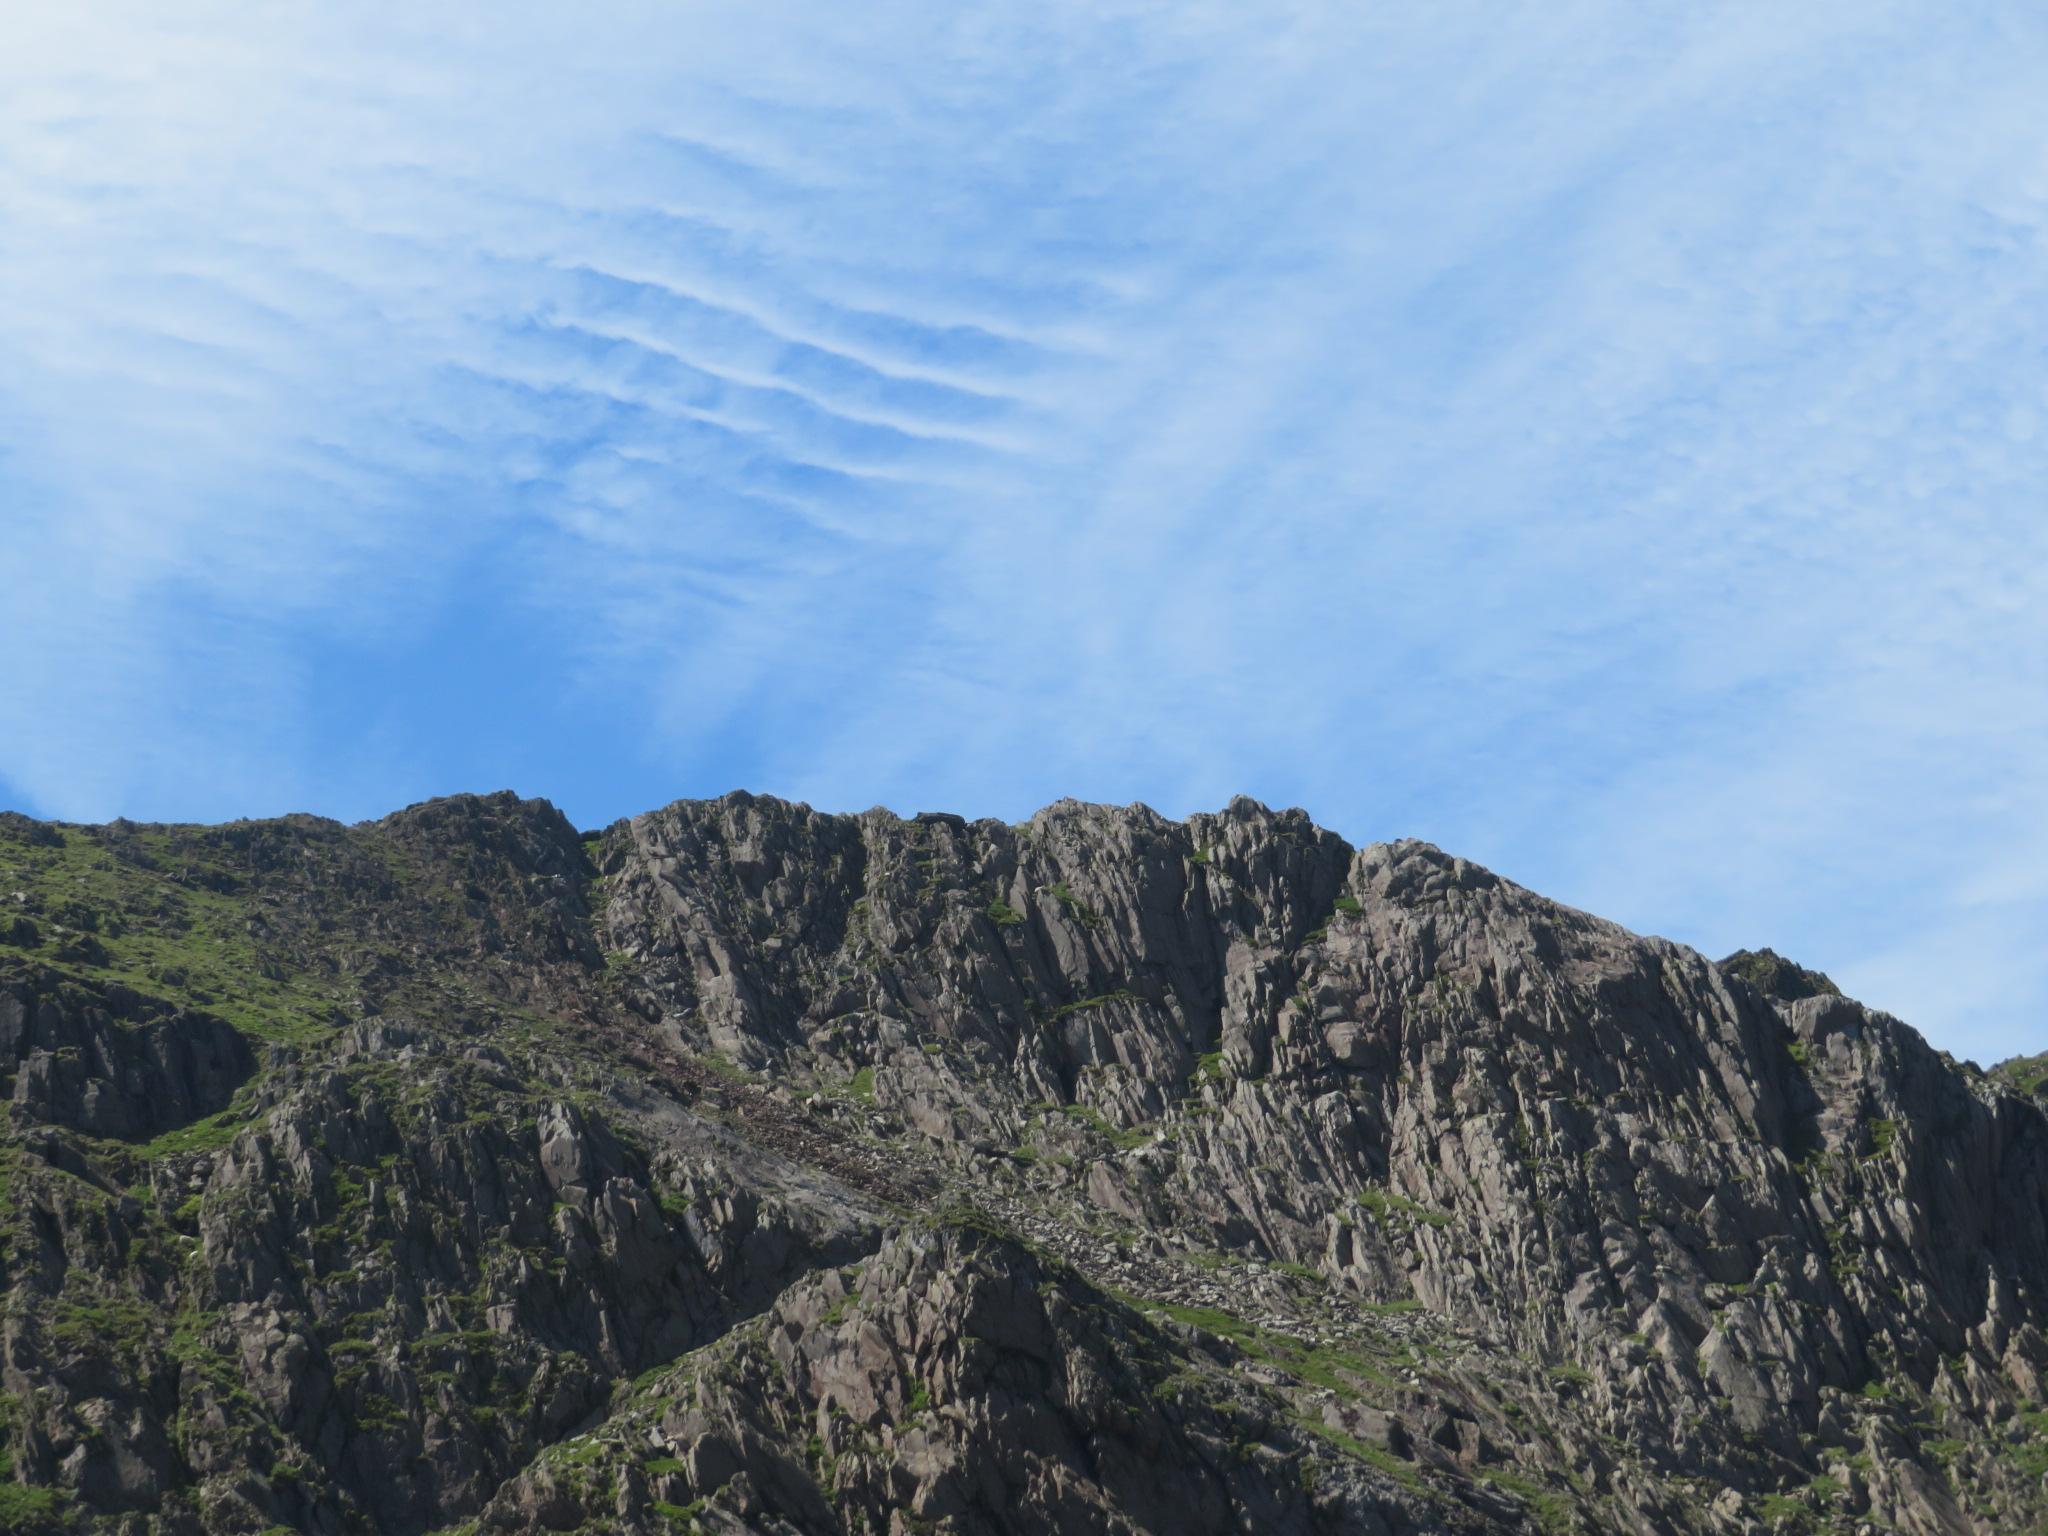 United Kingdom Wales Snowdonia, Snowdon Horseshoe, Jagged Lliwedd and sky, Walkopedia